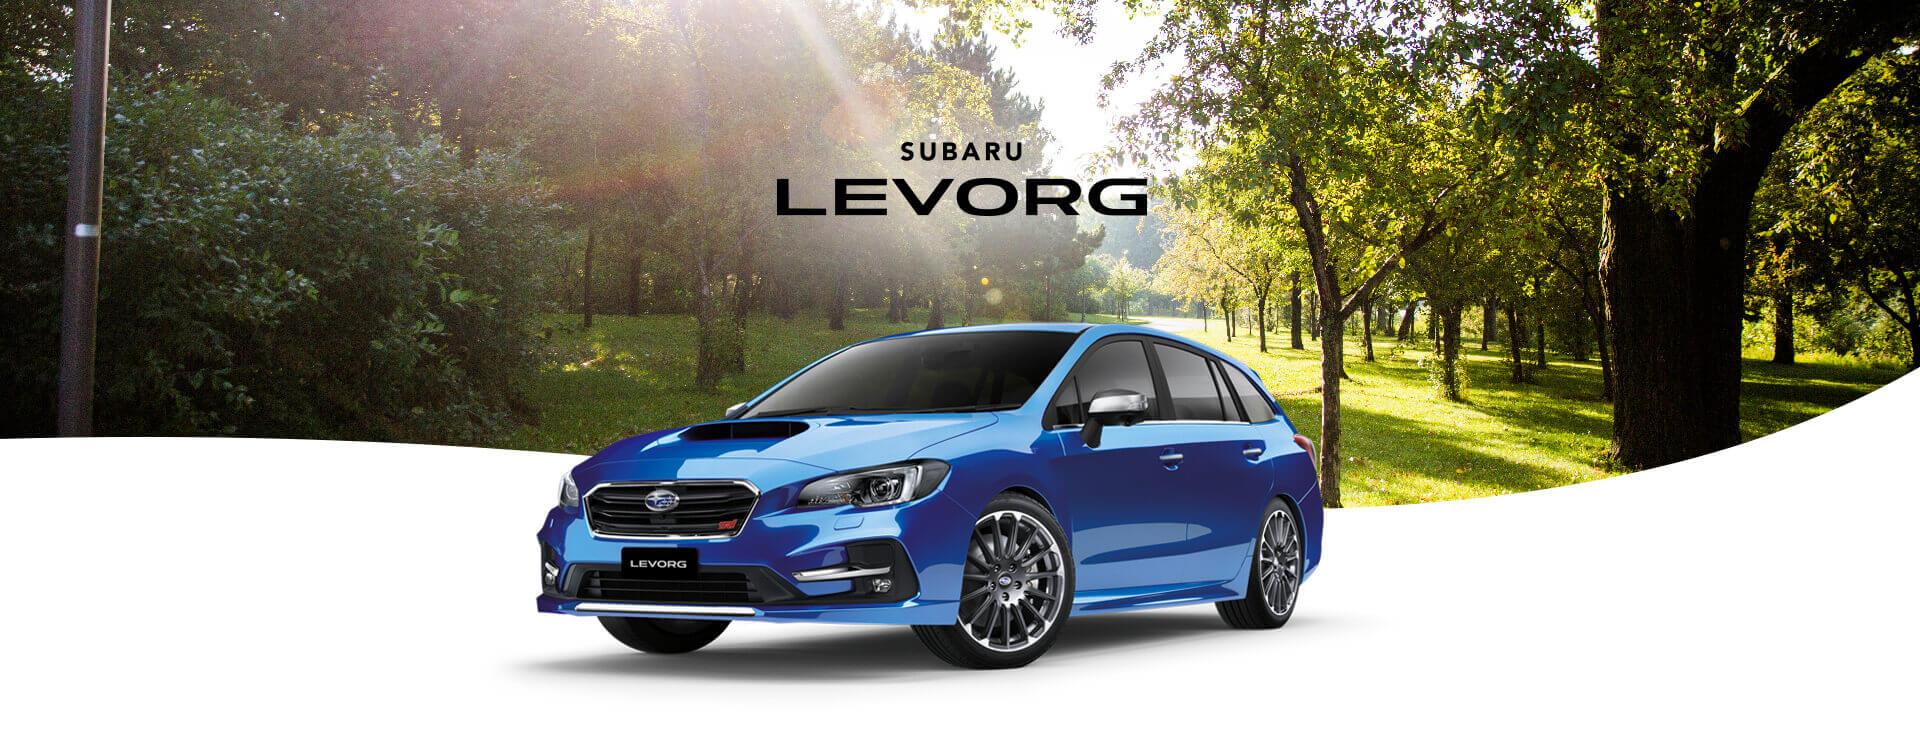 Subaru Levorg Image